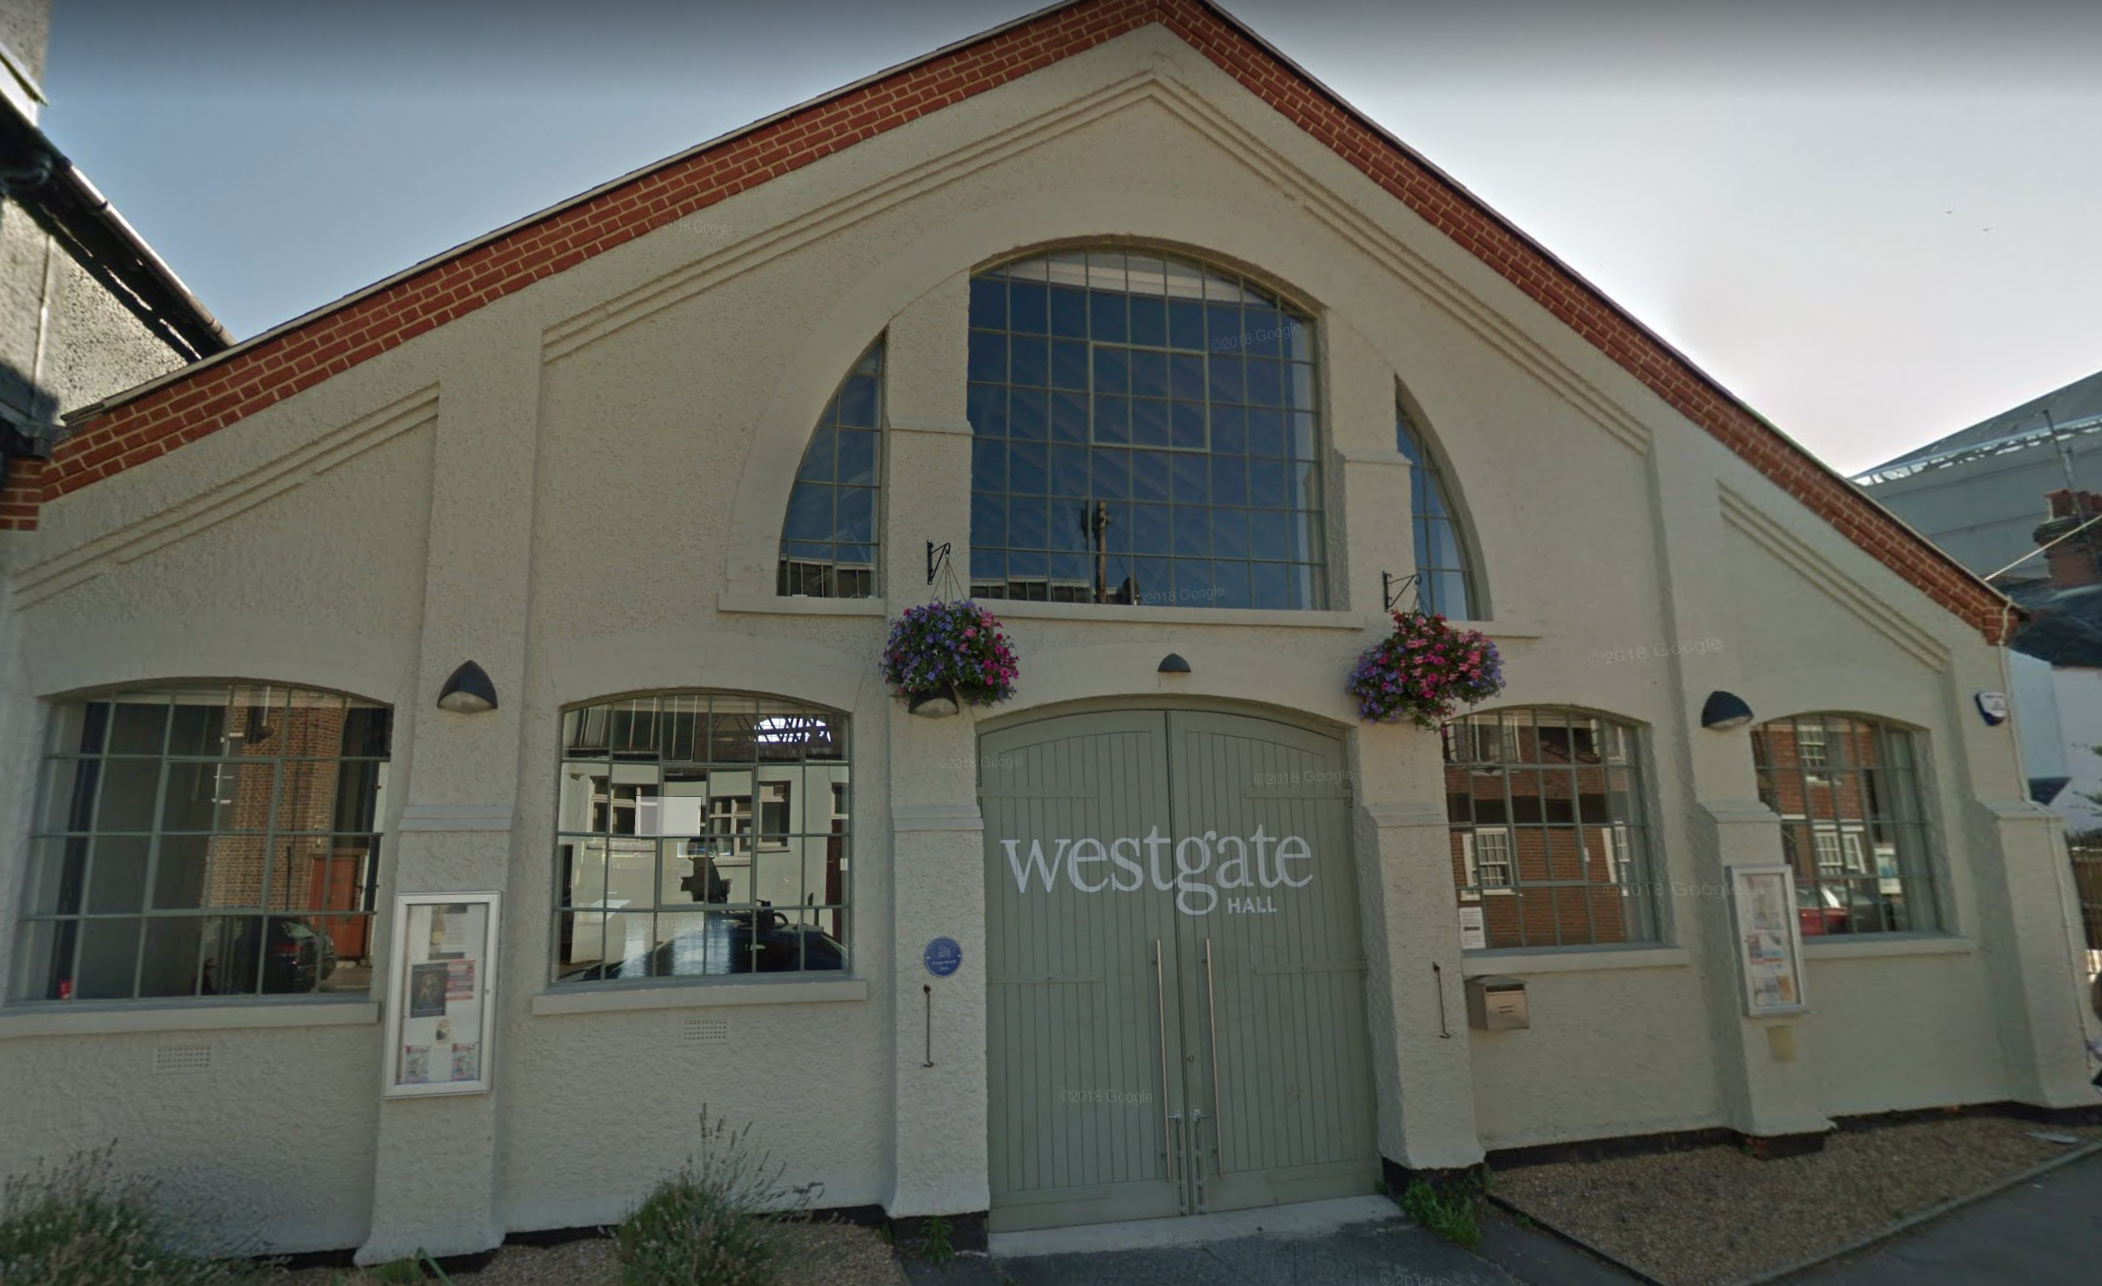 Canterbury - Westgate Hall Westgate Hall Rd, Canterbury CT1 2BT